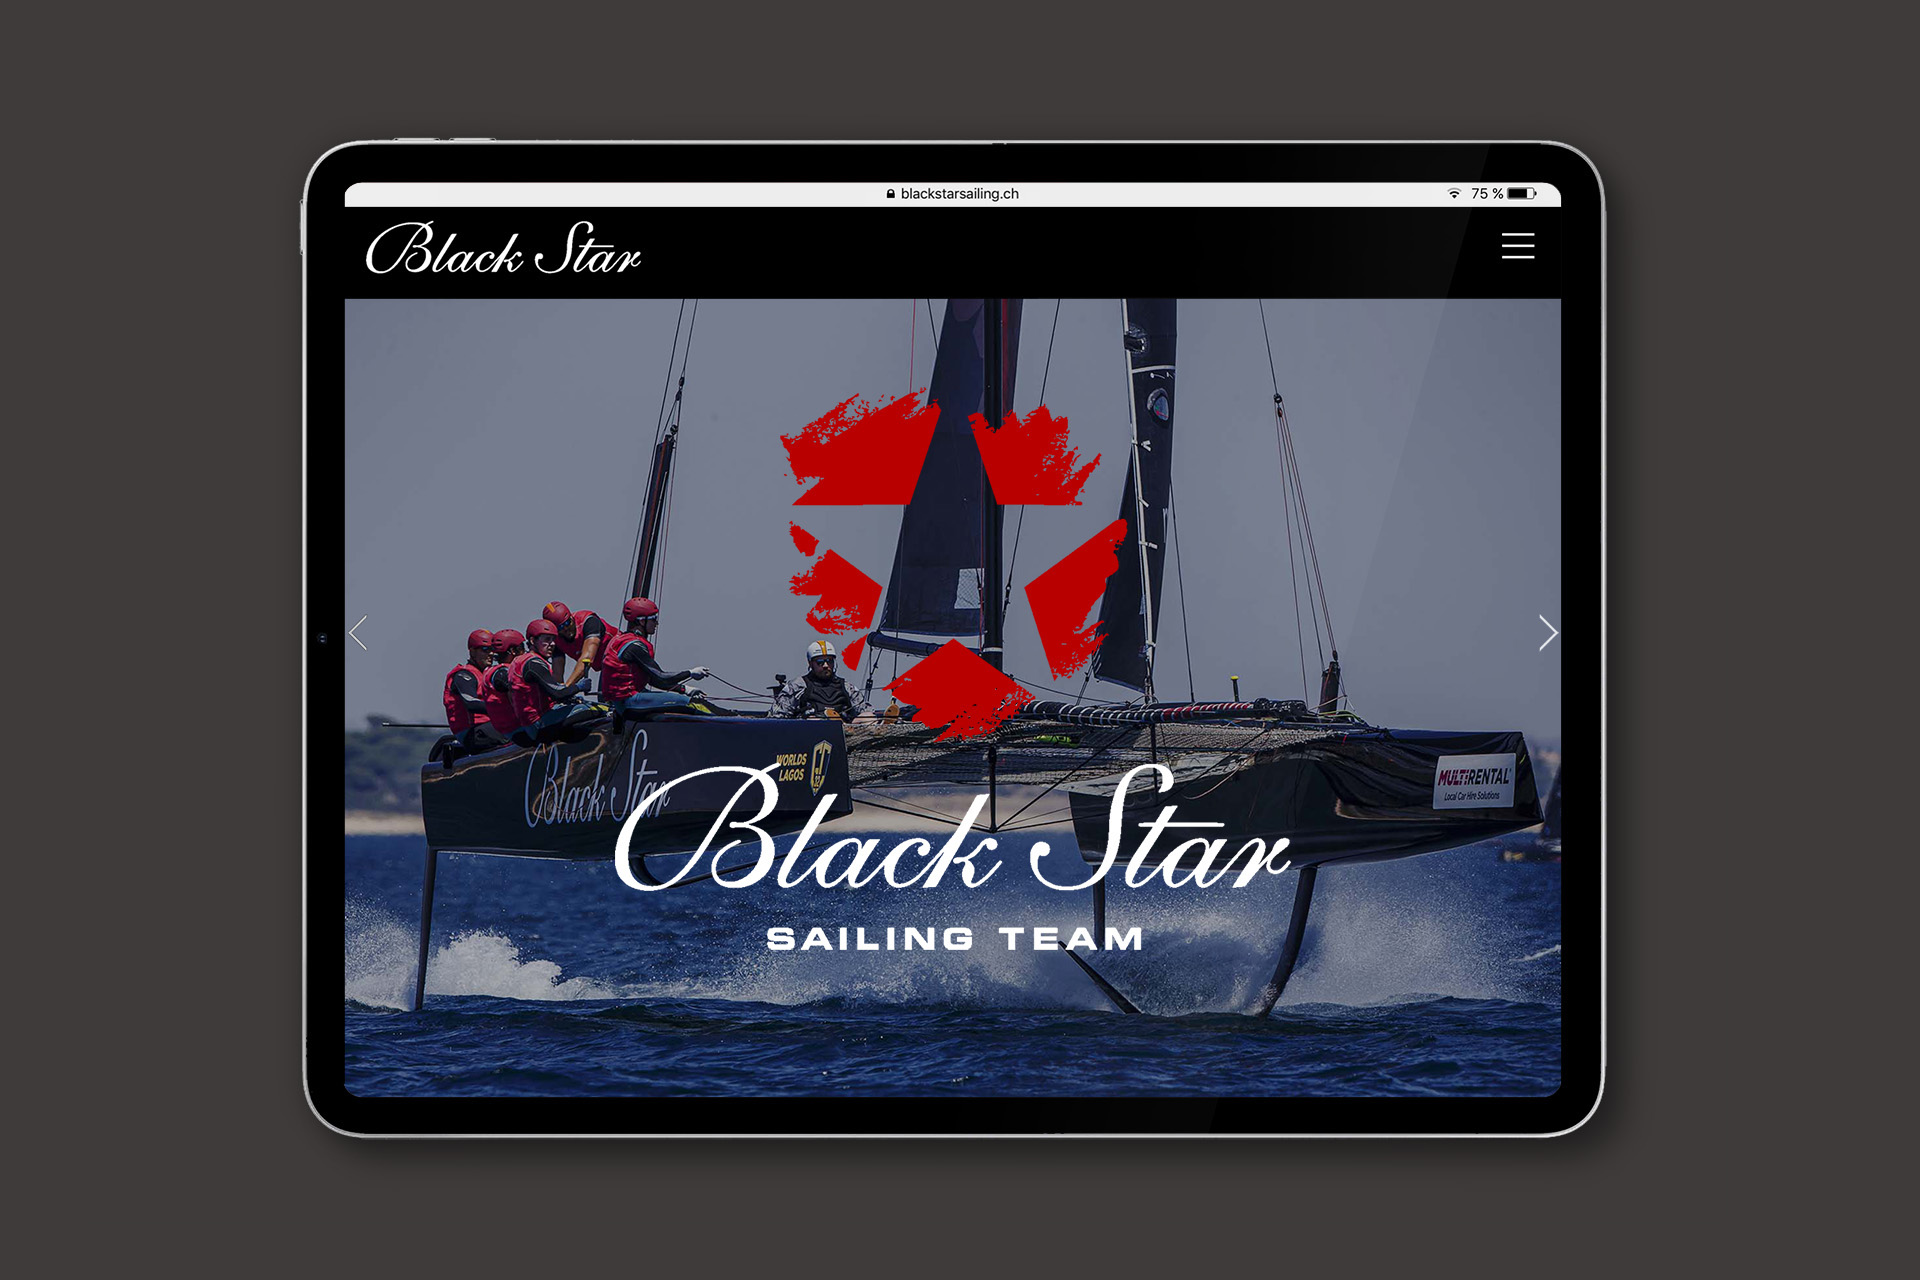 BlackStarSailing_iPad_04